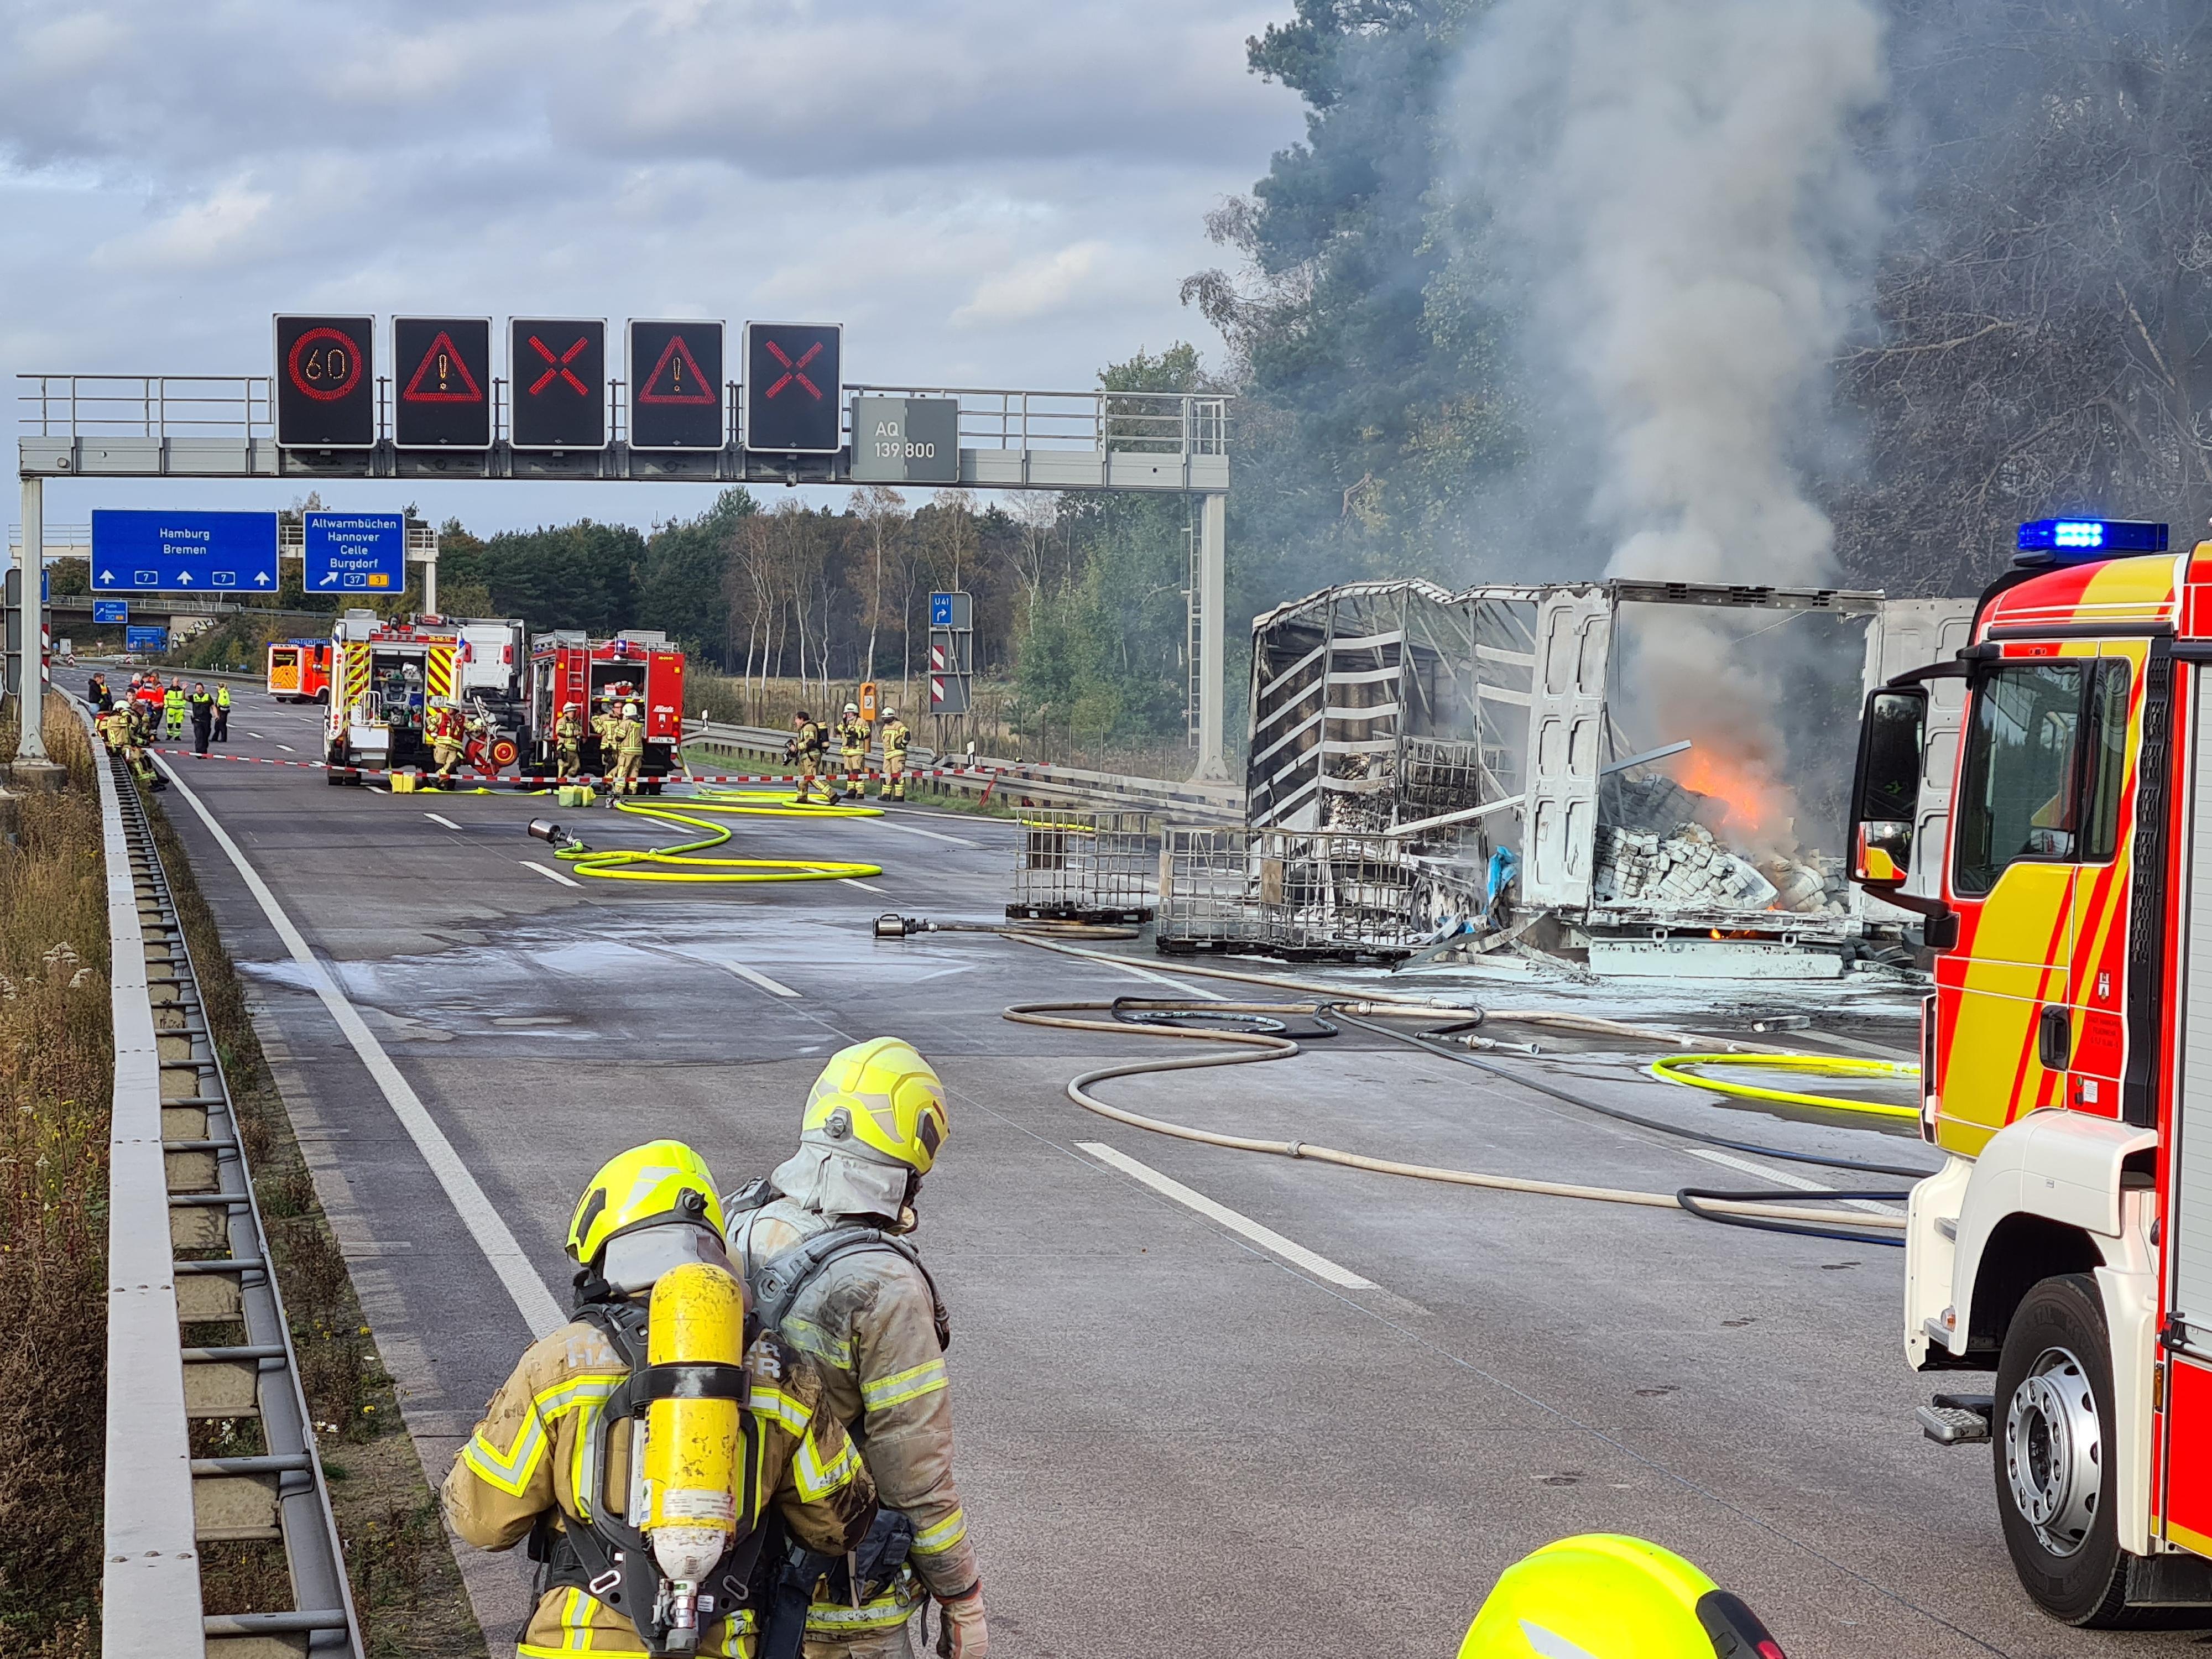 Stau-Chaos: A7 Richtung Norden nach LKW-Unfall wieder einspurig befahrbar